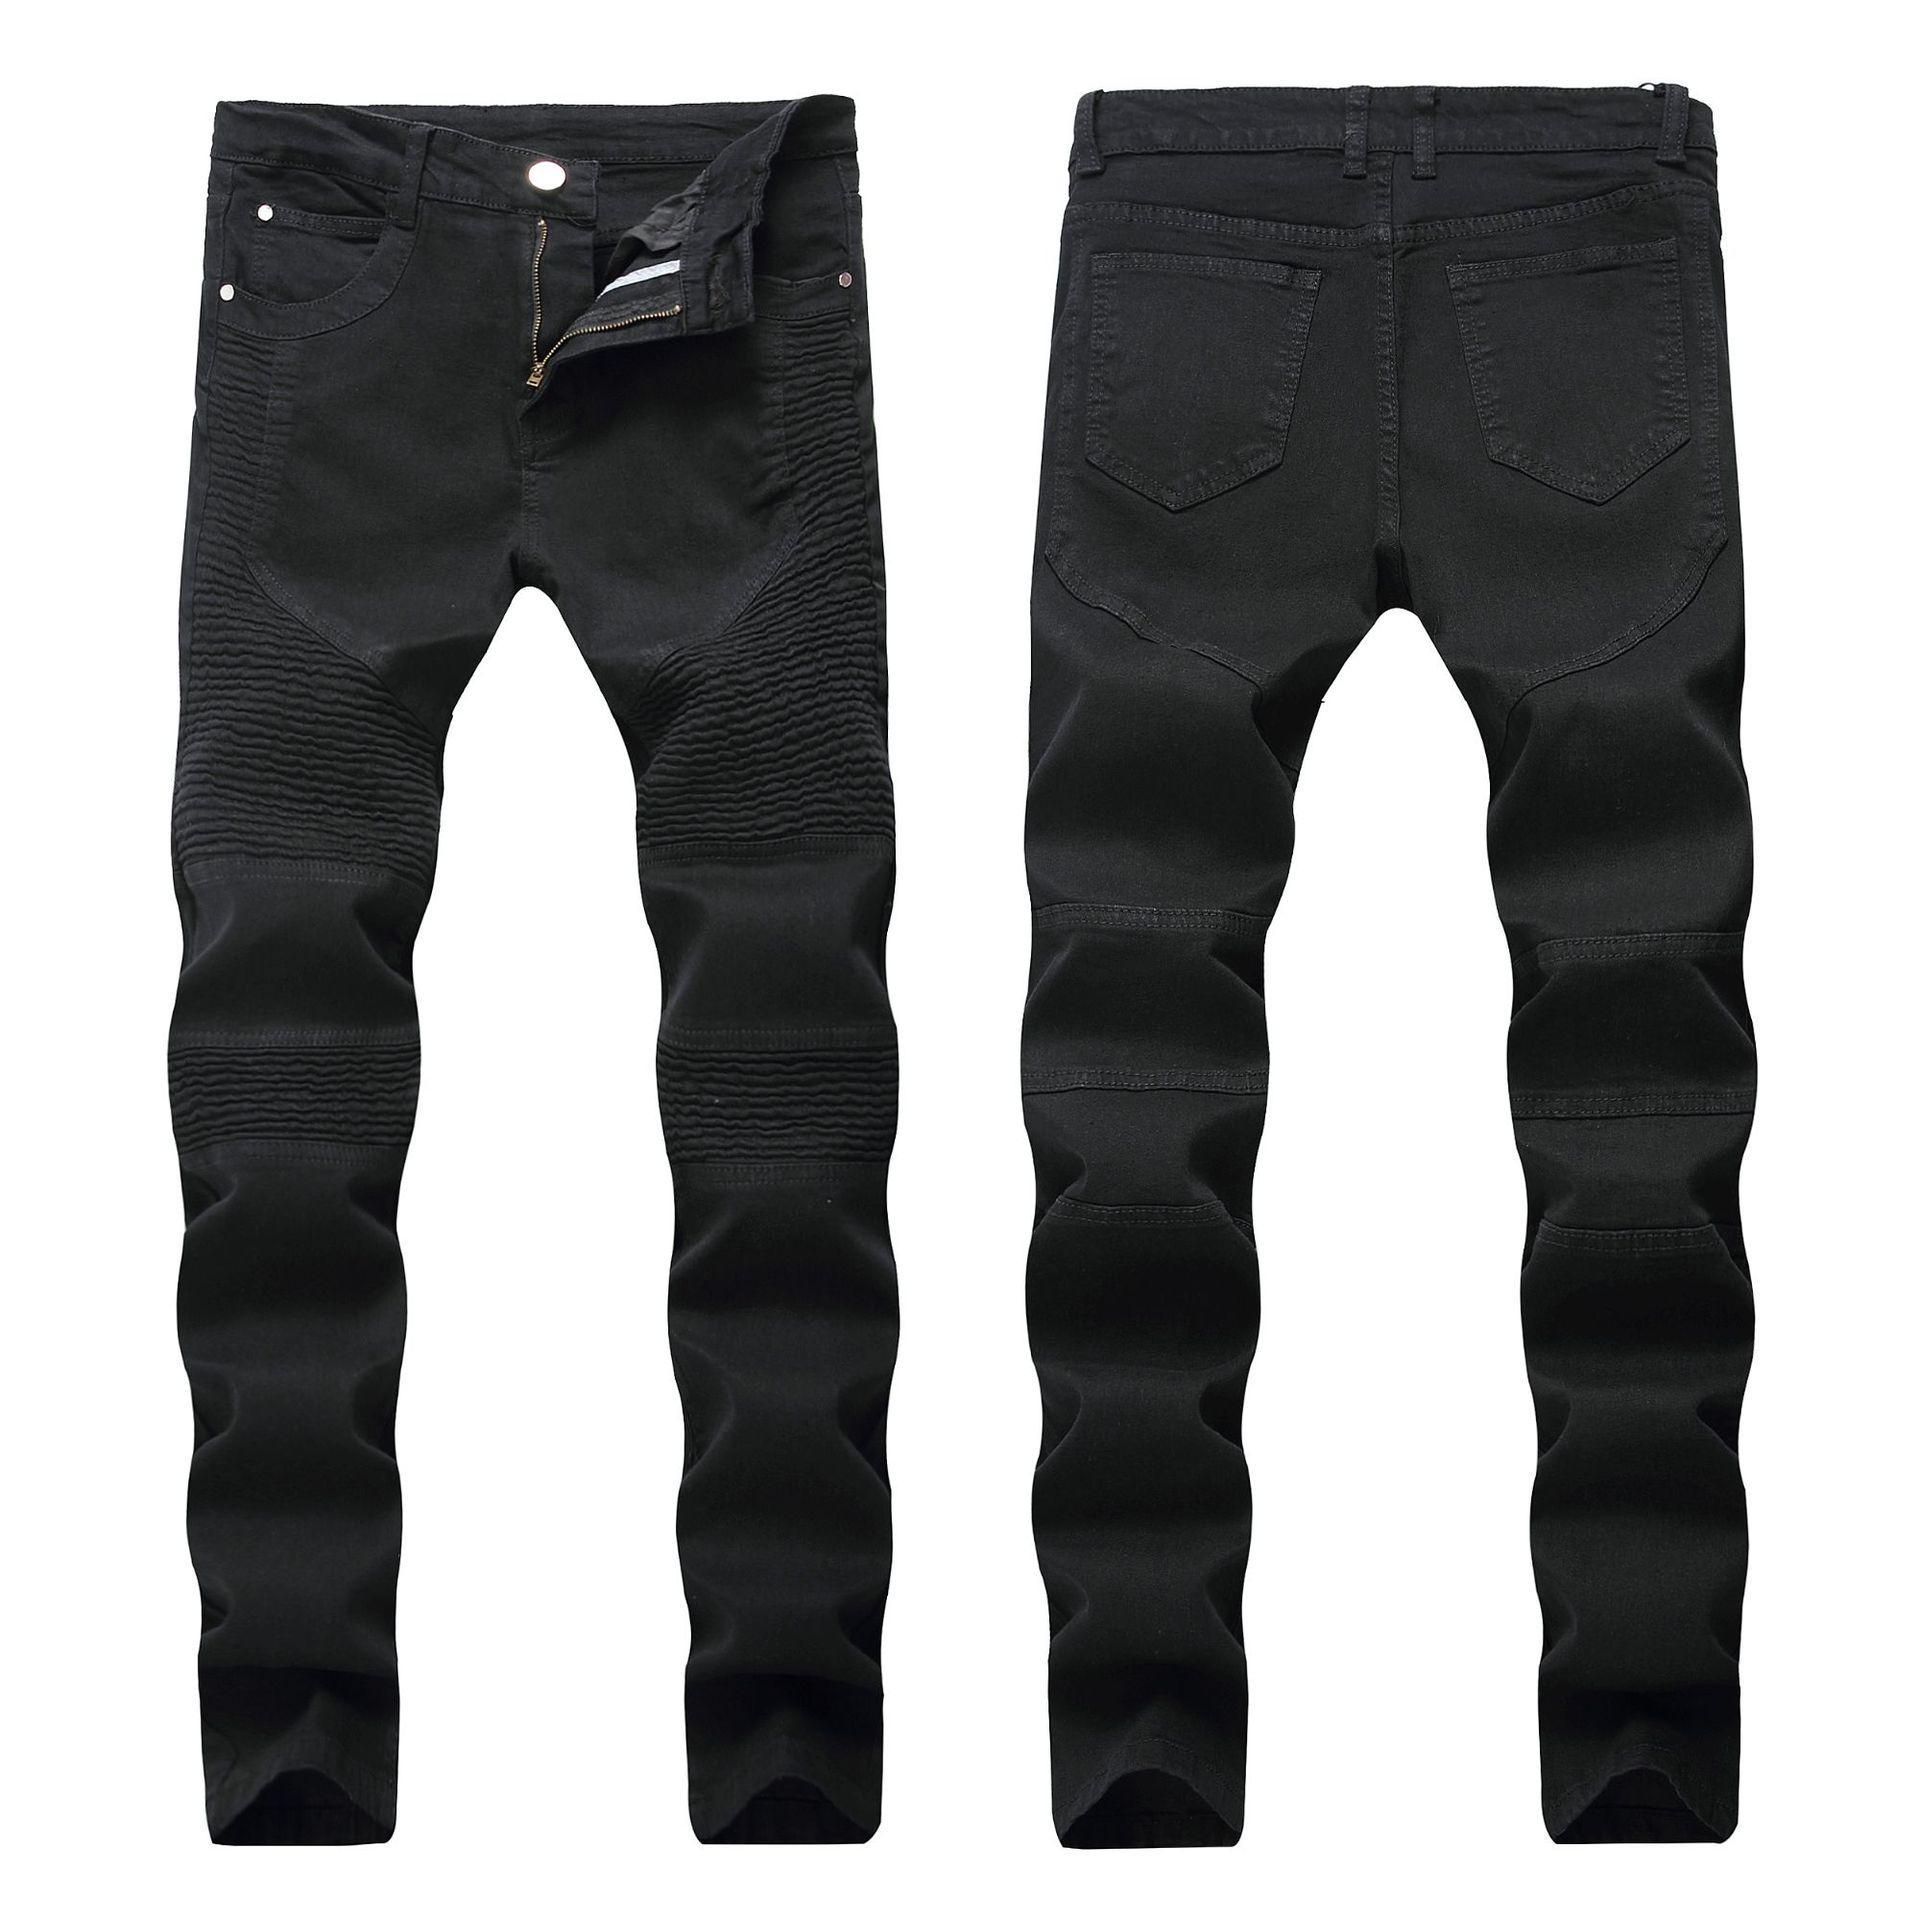 Sıska Erkek Siyah Kot Serin Erkekler Kot Streç Slim Fit Düz Denim Biker Jeans Hip Hop Erkekler Streetwear 1688 #